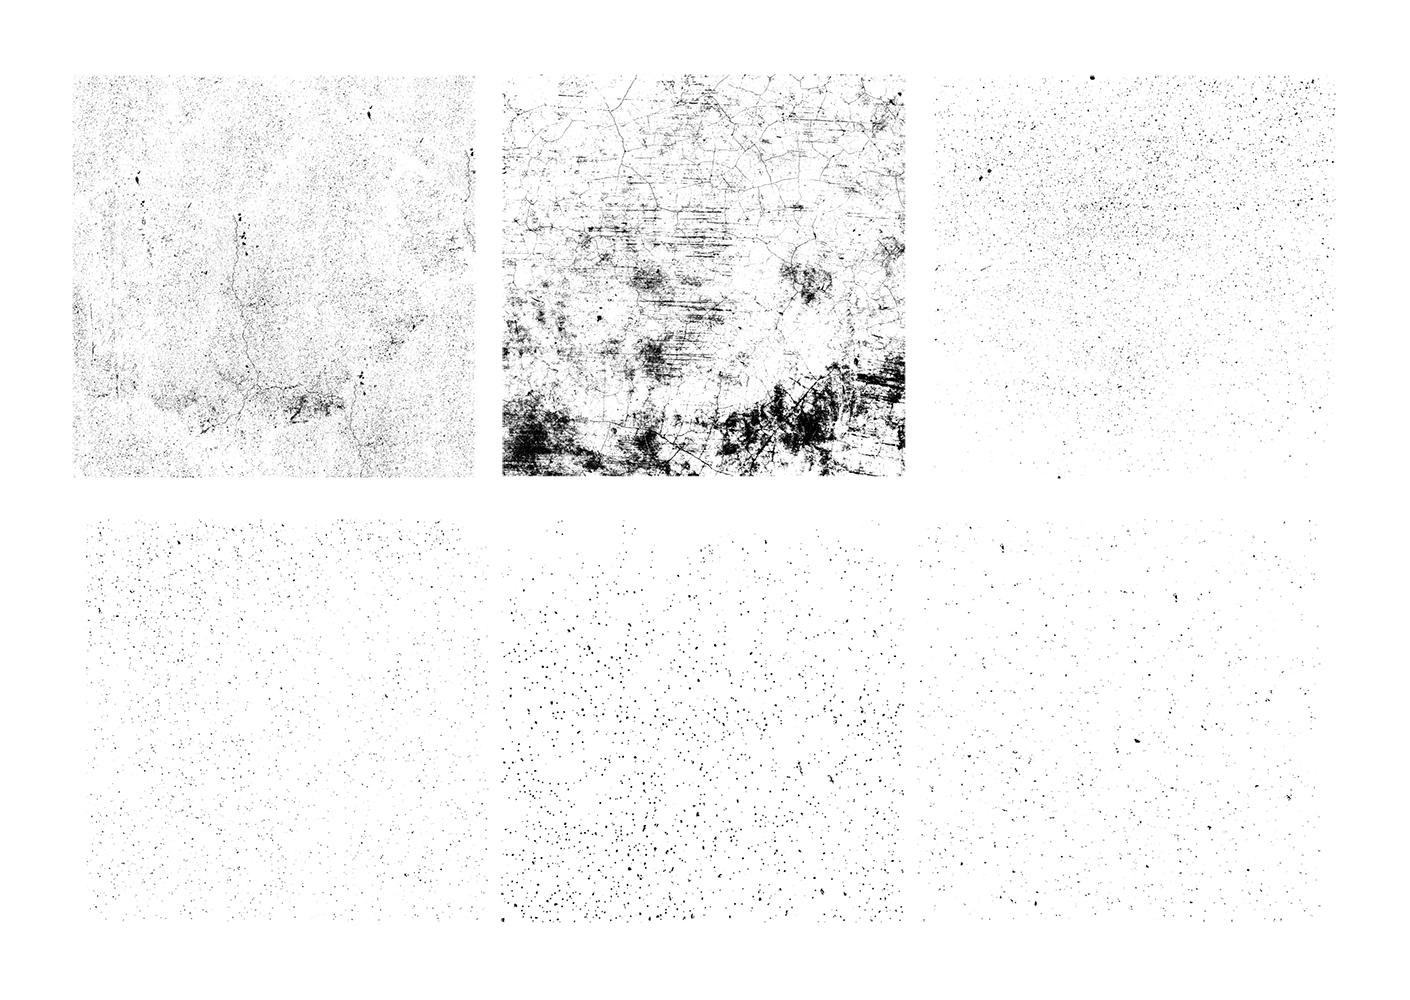 image asset 2